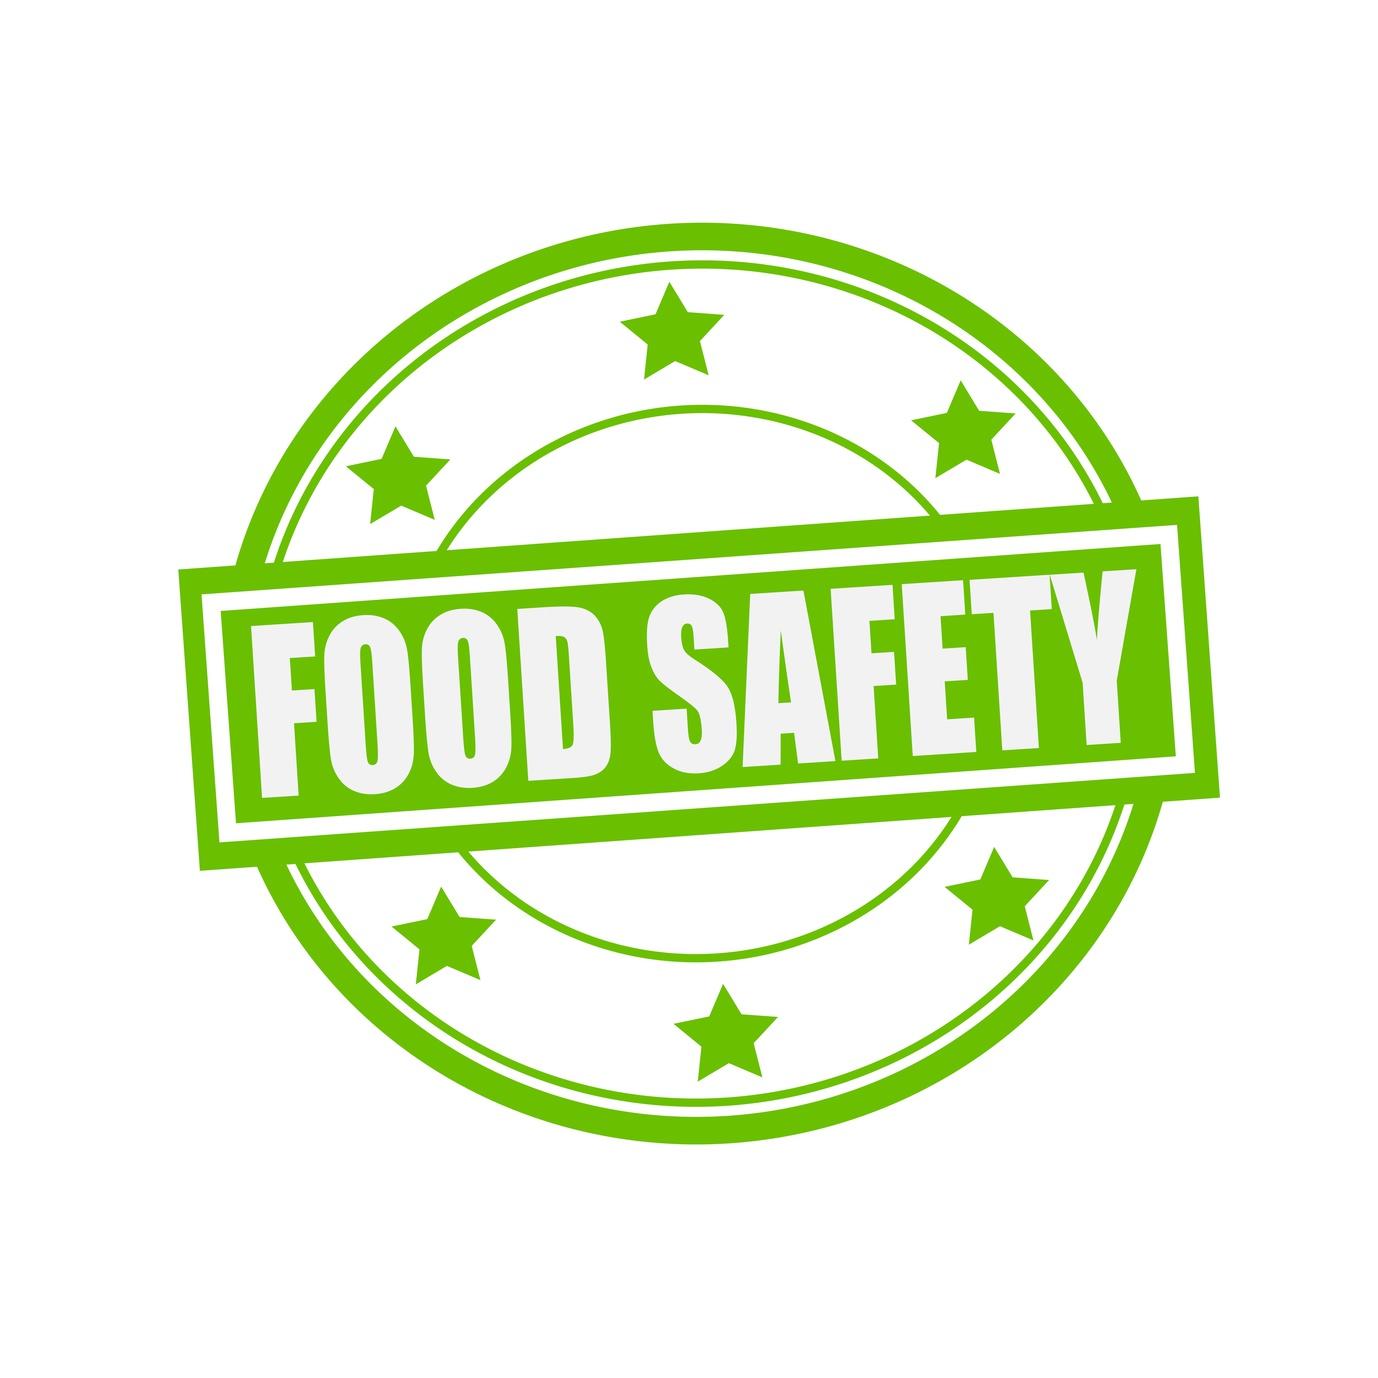 Superior Food Safety: May 2016